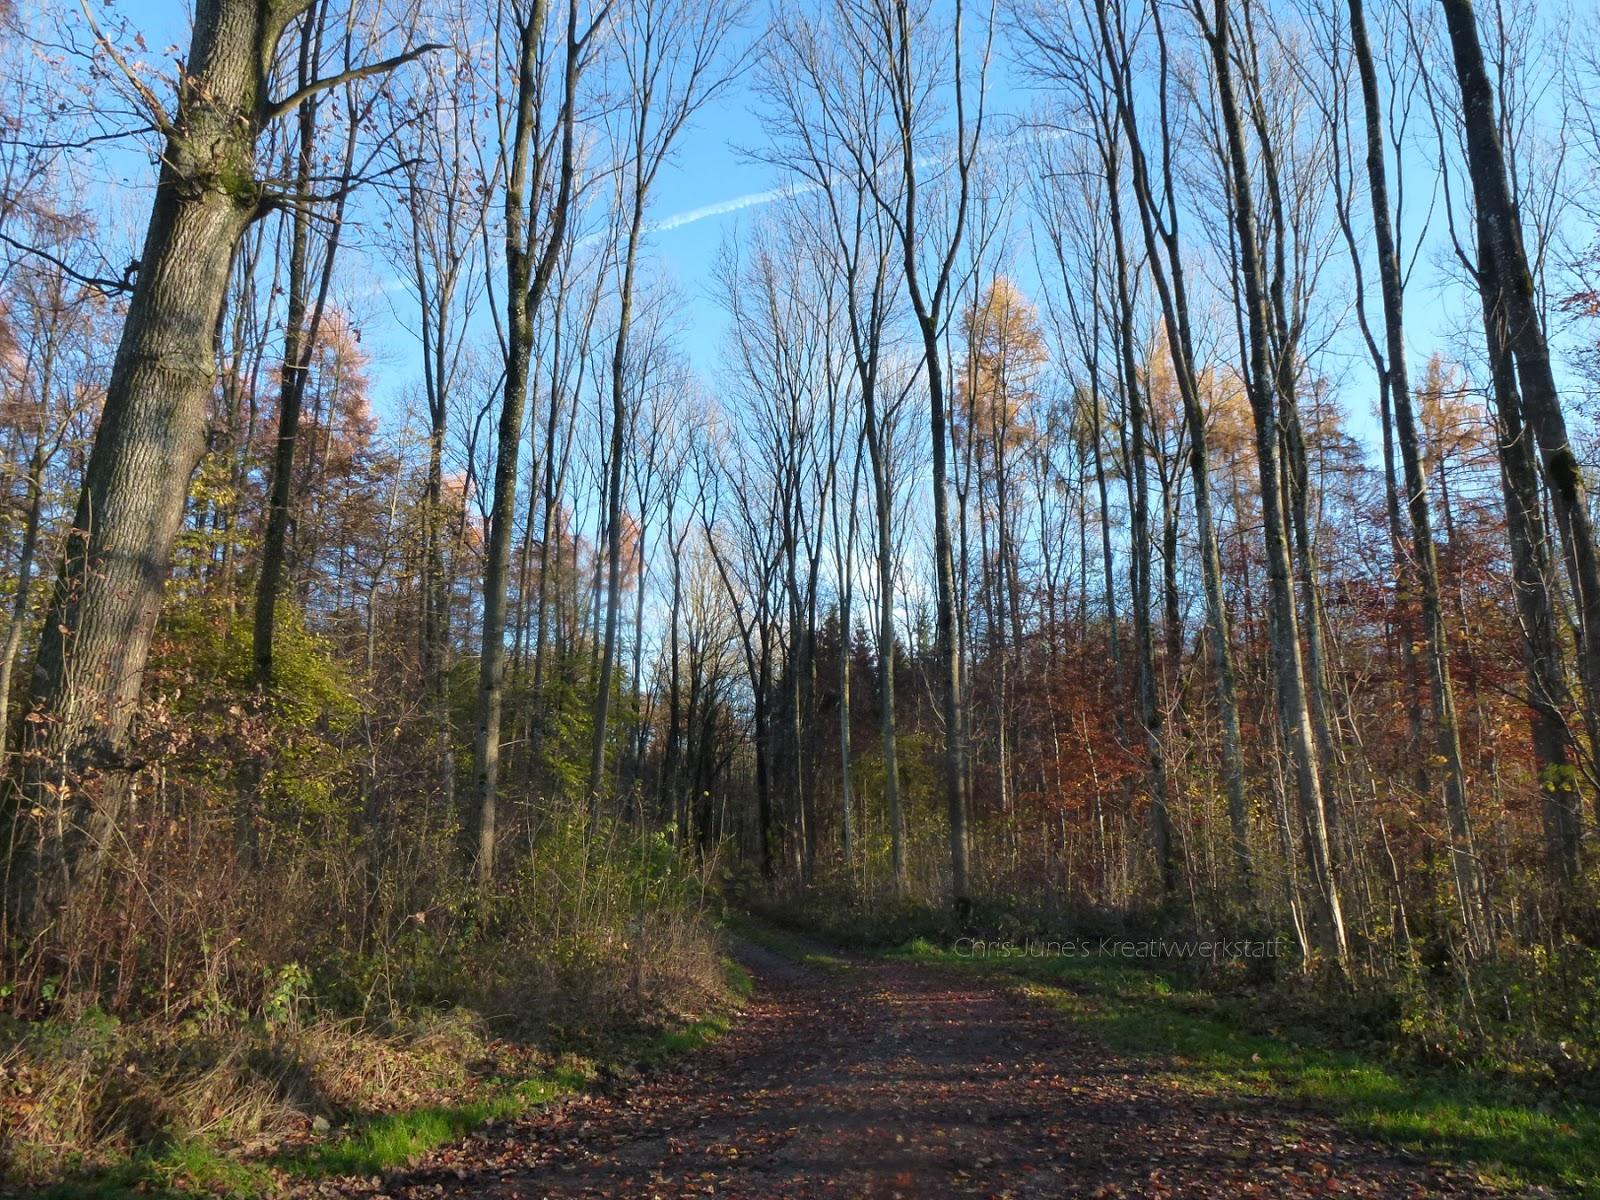 Waldweg im November